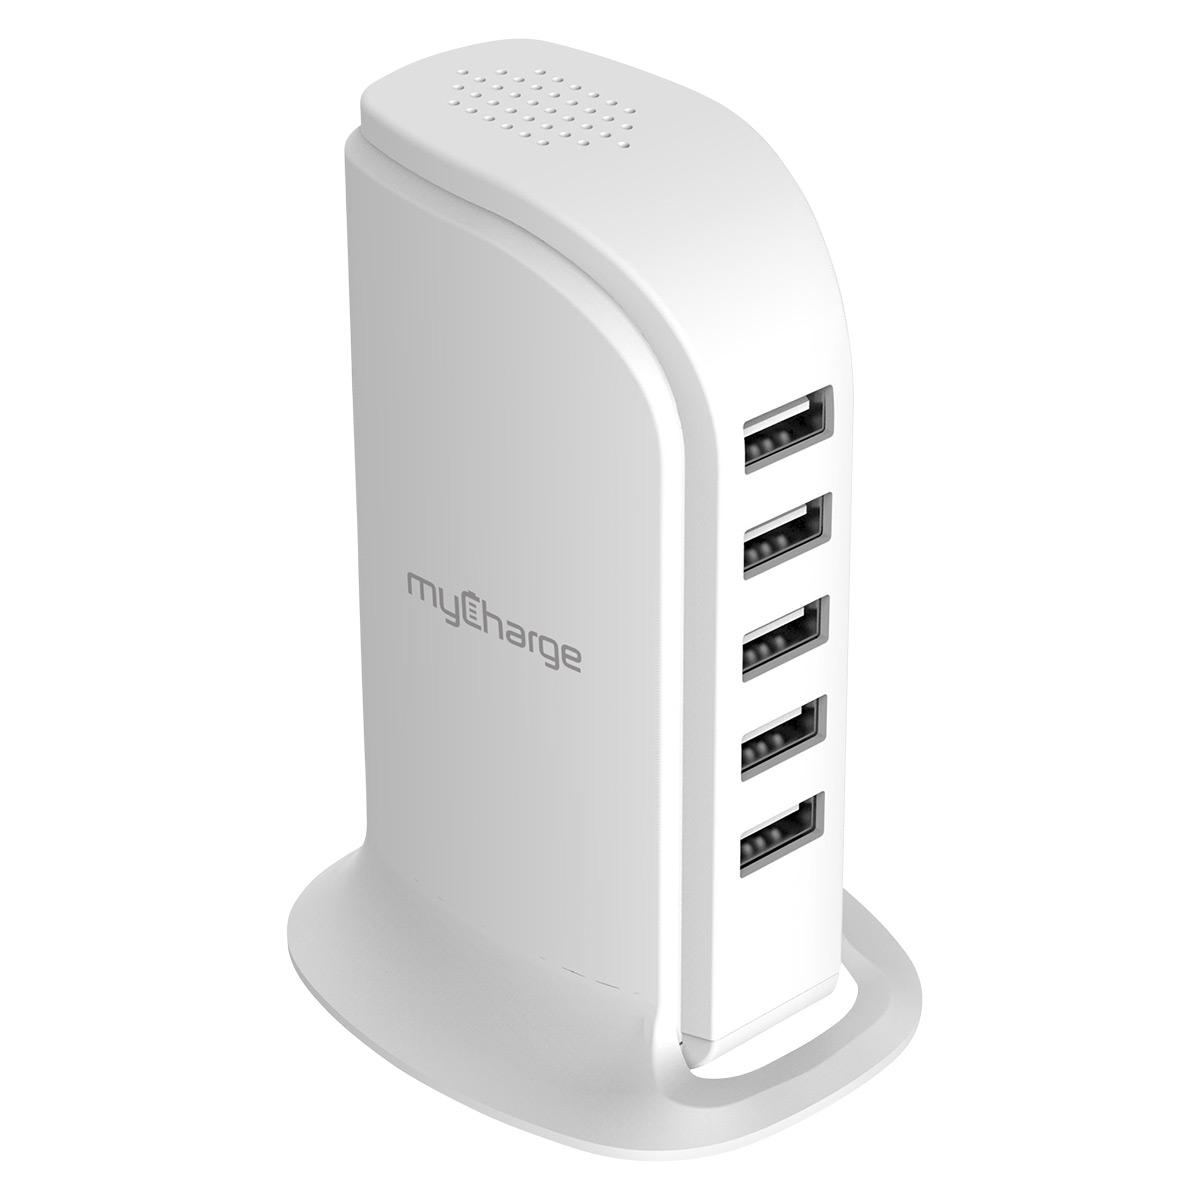 MyCharge Deluxe 5-USB Charging Hub